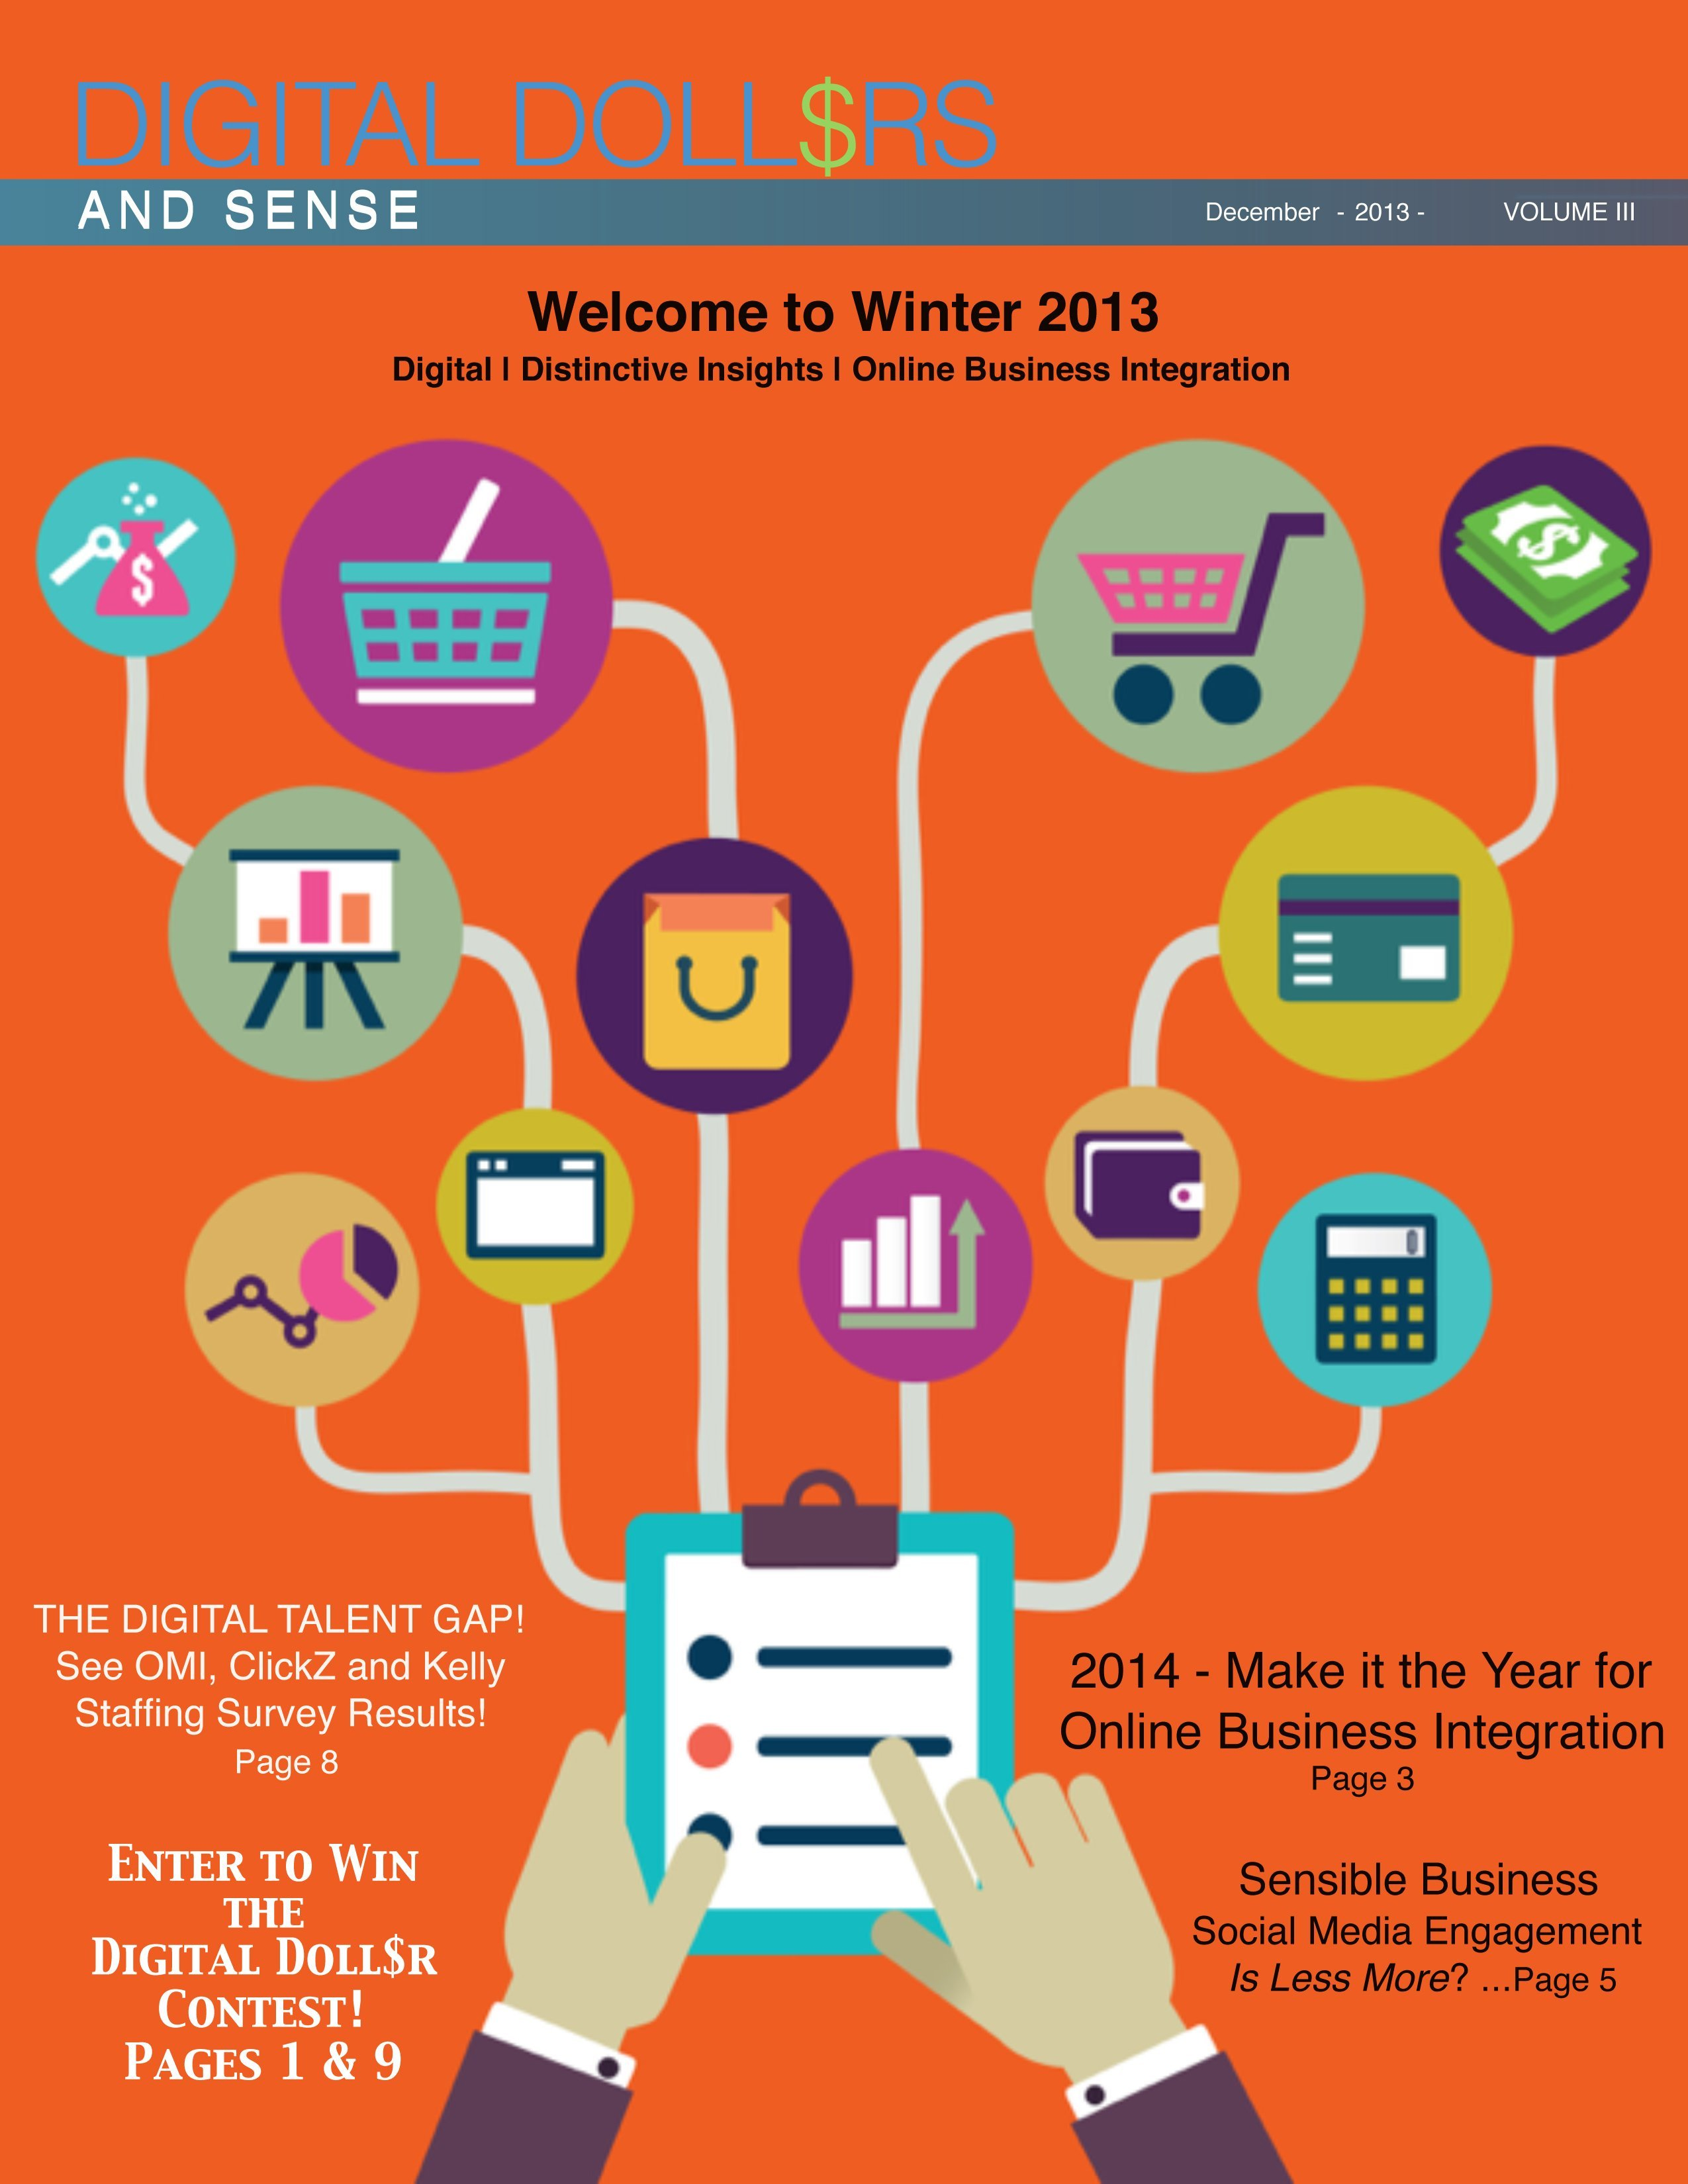 Digital Dollars & Sense Winter 2013